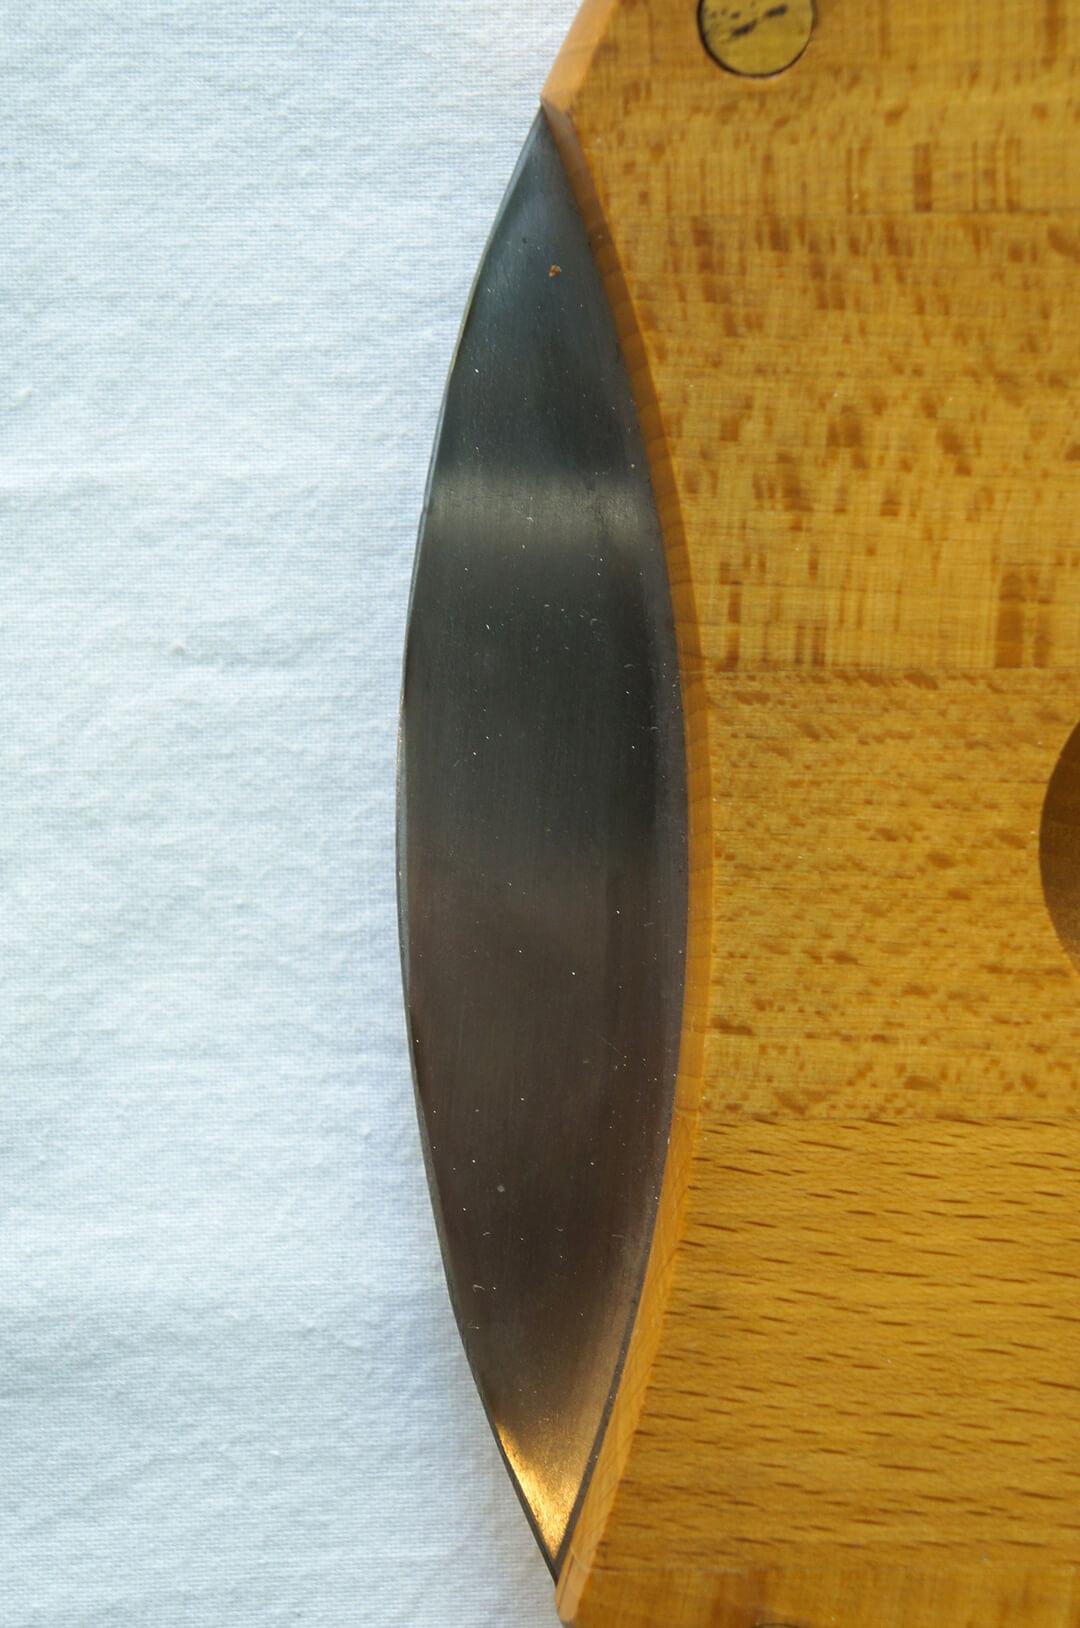 Beech Wood Cutting Board Made In Denmark/デンマーク製 カッティングボード ビーチ材 北欧雑貨 食器 インテリア 1